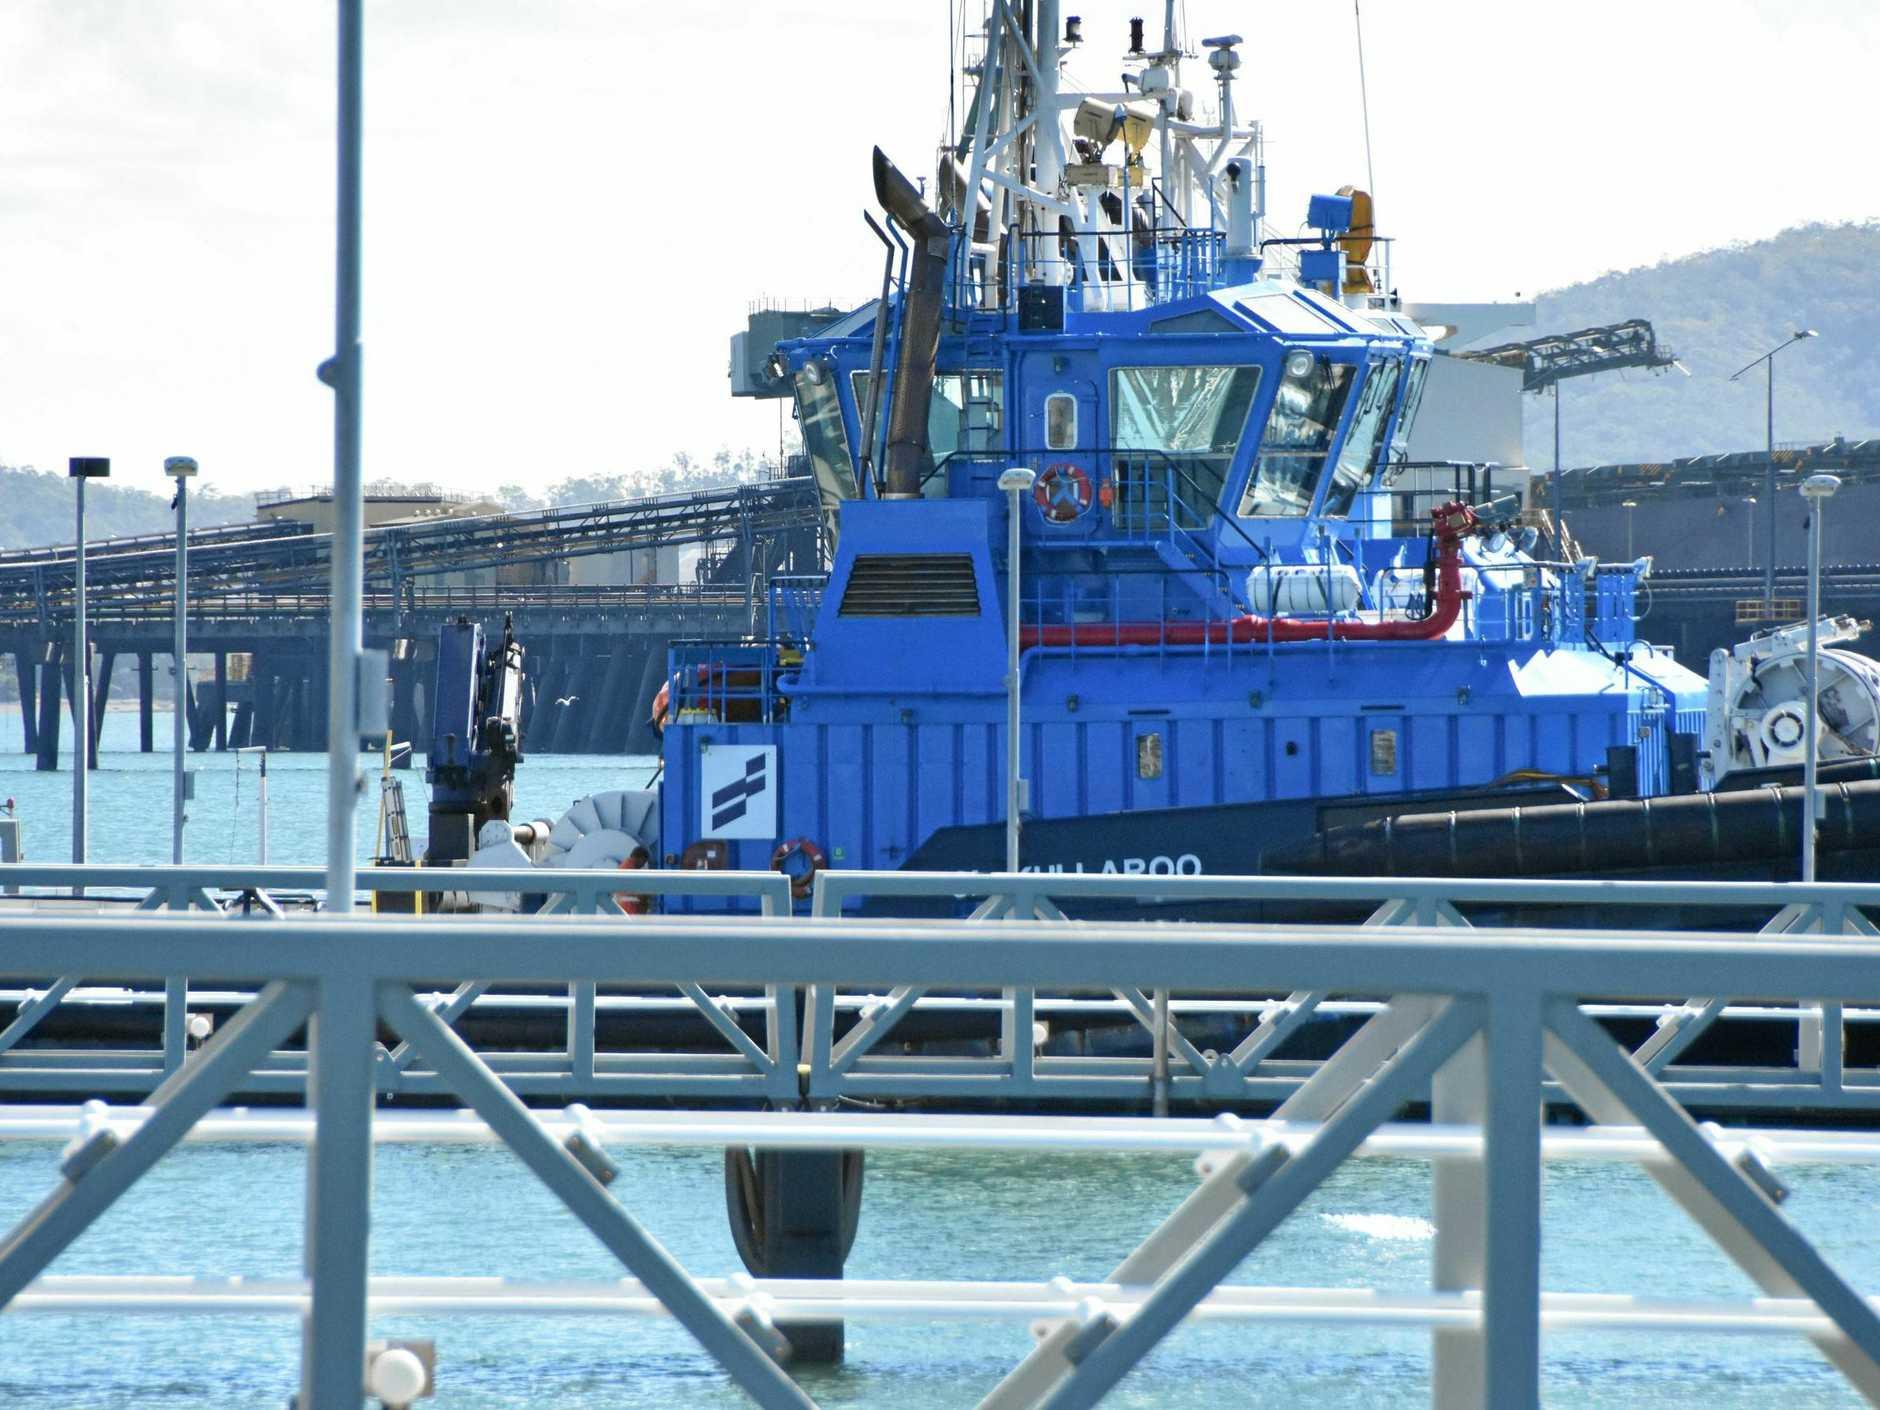 Tug ship Kullaroo pictured on June 13.